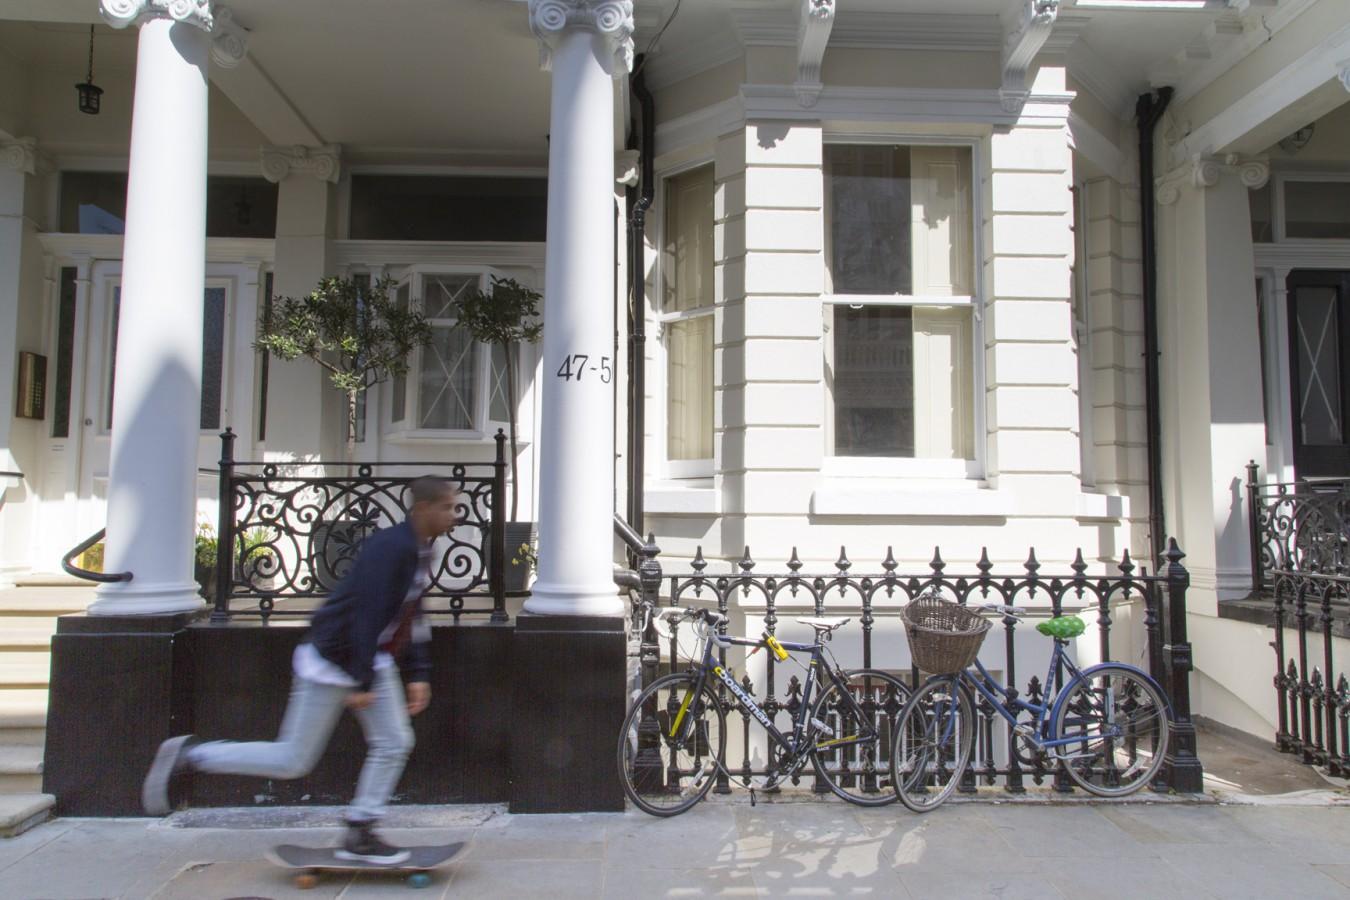 Richmond University image of a man skateboarding outside a block of flats in London